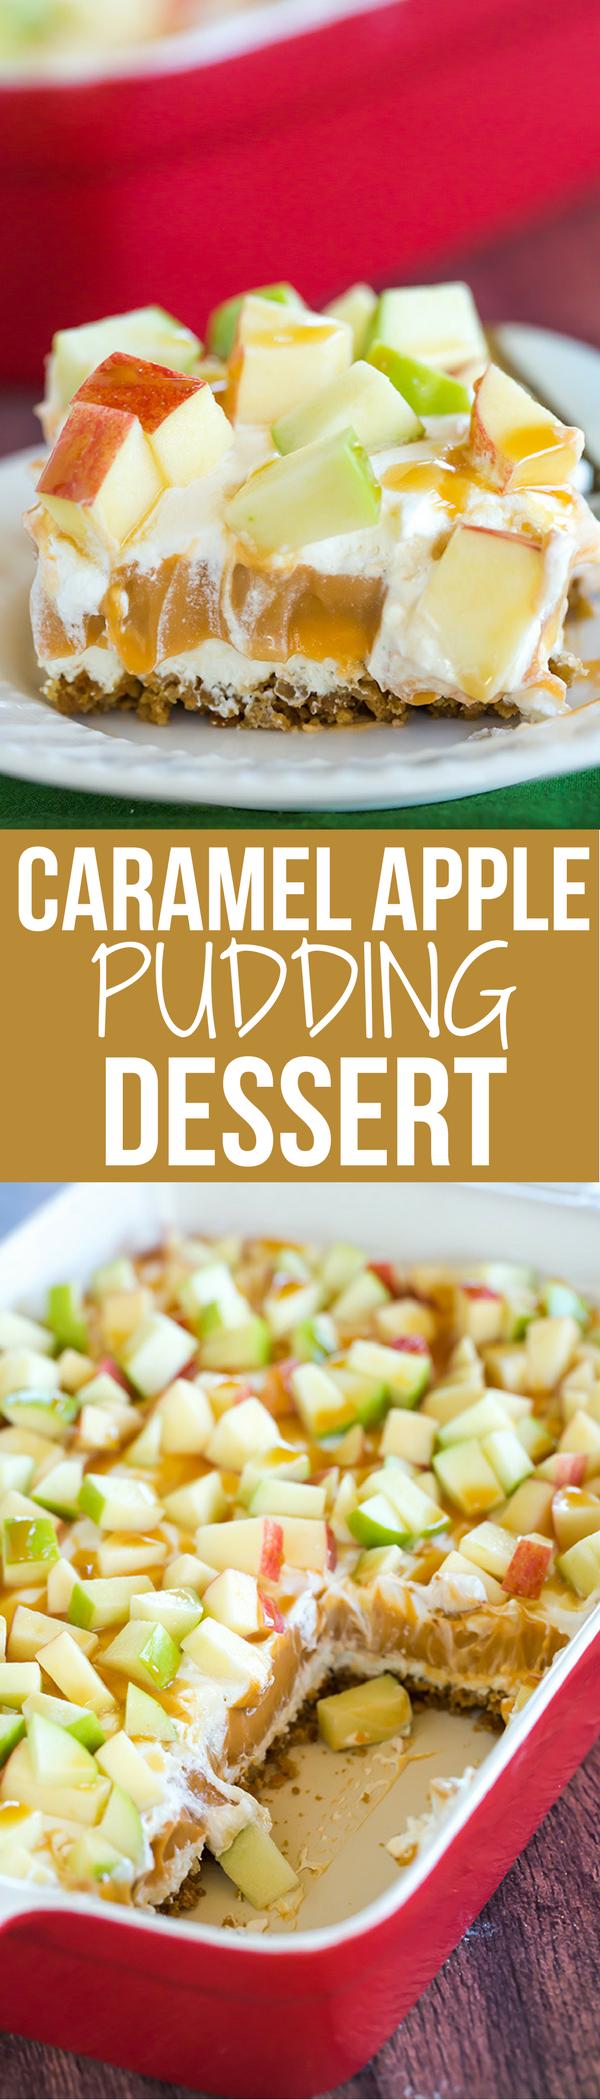 No-Bake Caramel Apple Pudding with Gingersnap Crust